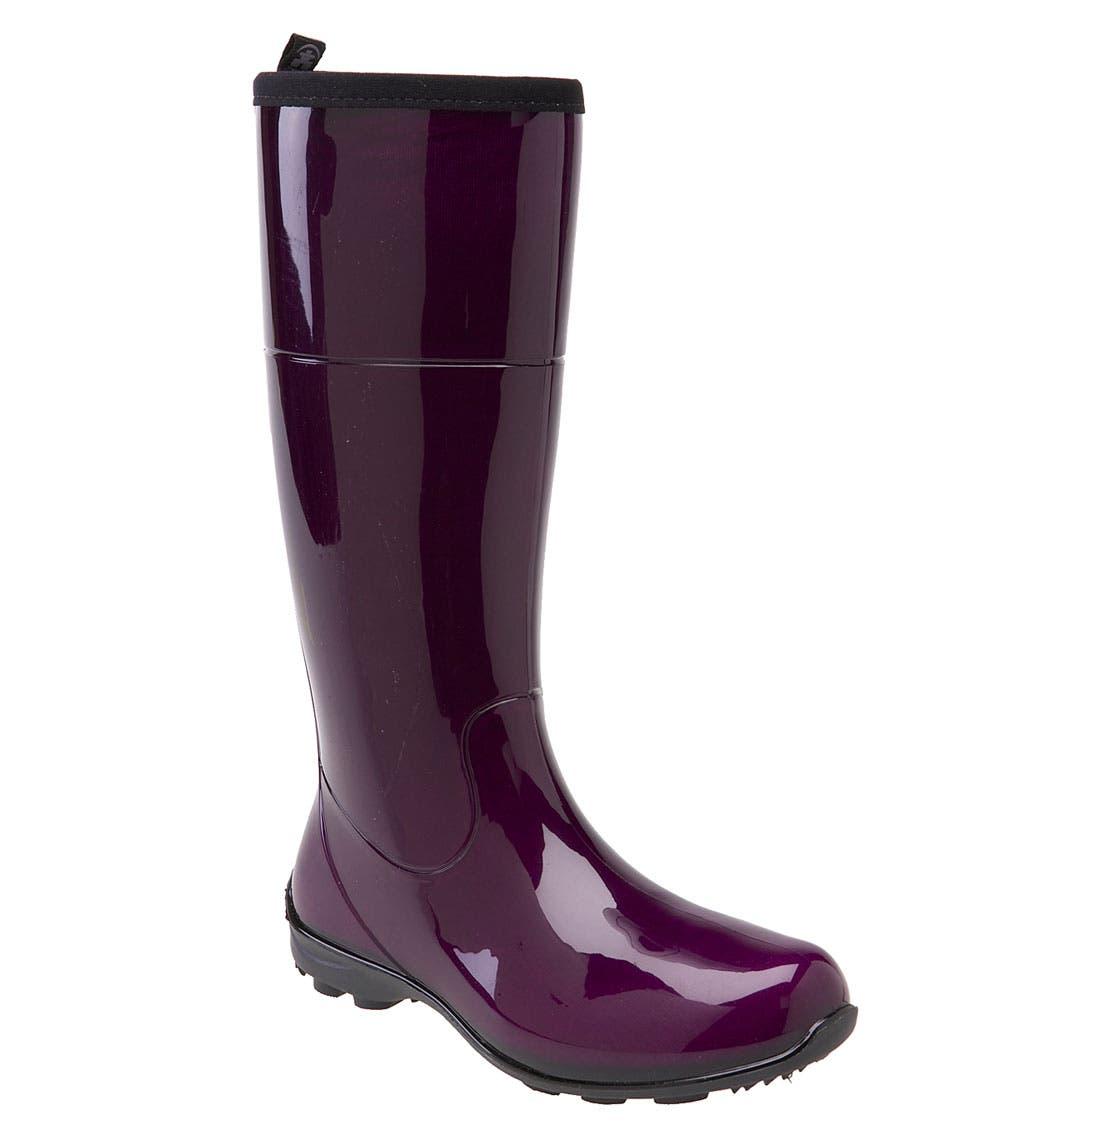 Main Image - Kamik 'Ellie' Rain Boot (Women)